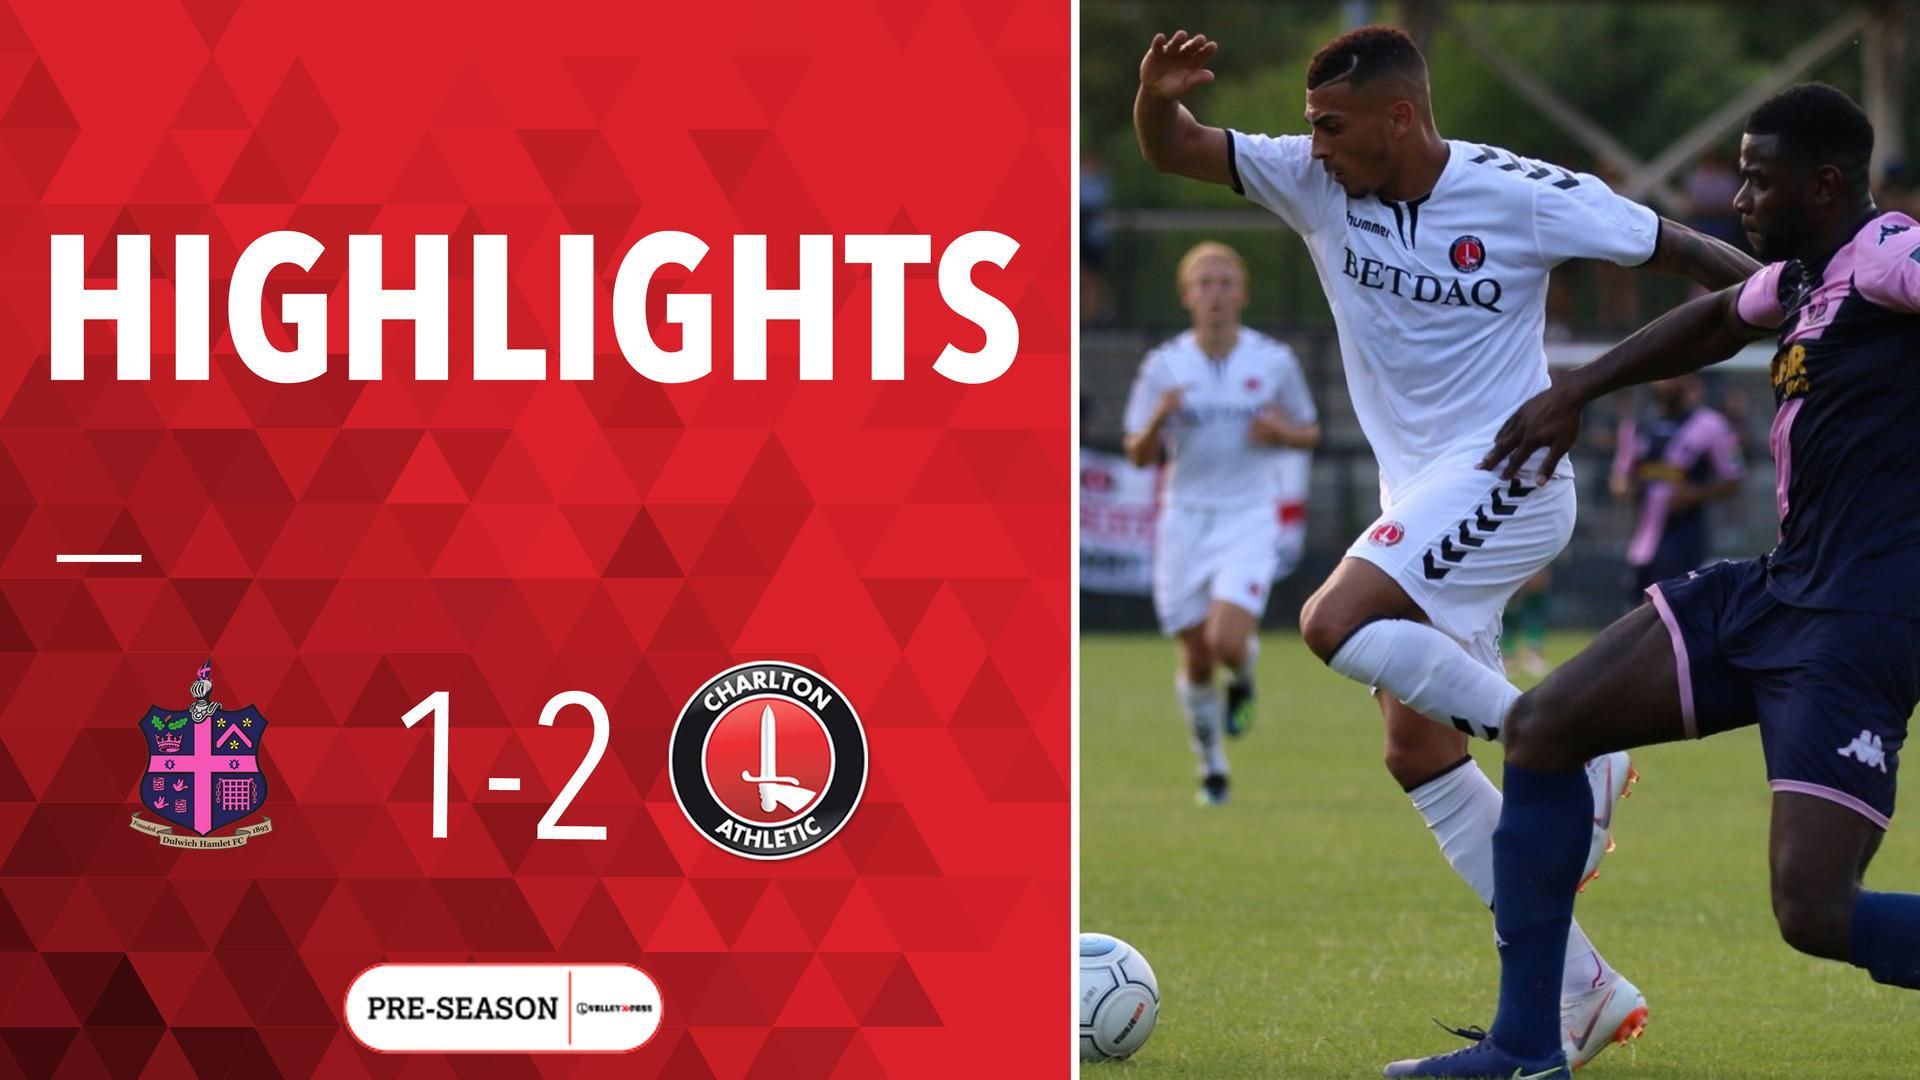 HIGHLIGHTS | Dulwich Hamlet 1 Charlton 2 (Pre-season 2018)